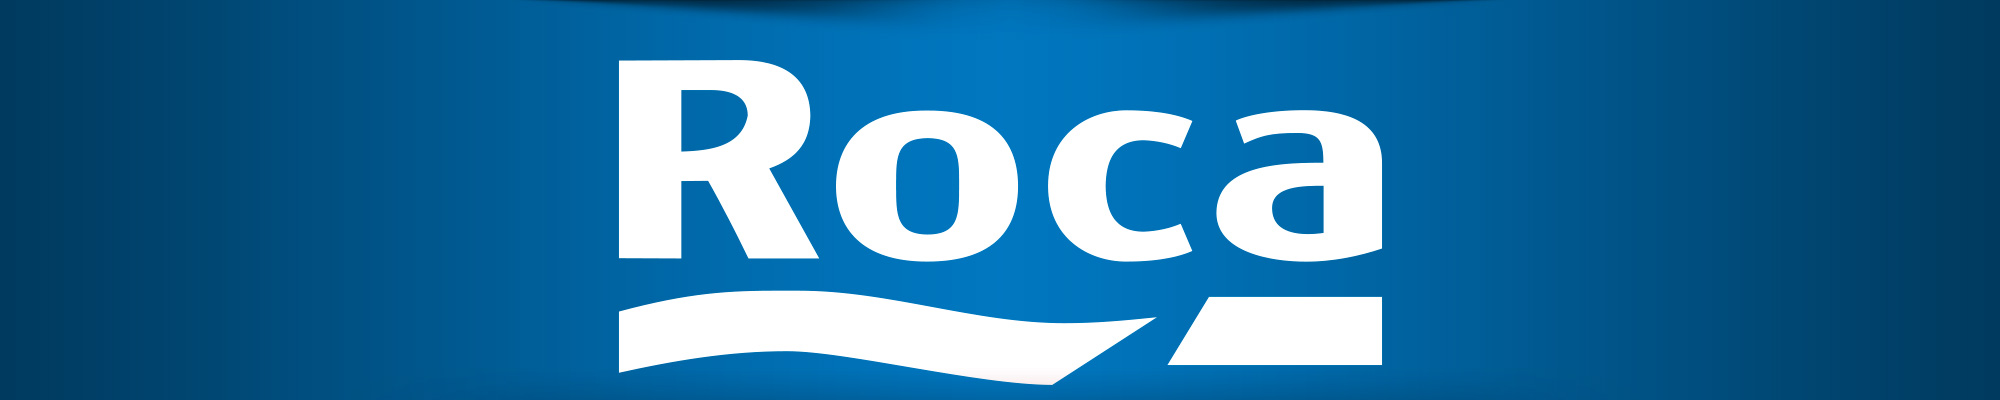 Servicio t cnico roca en mallorca for Servicio tecnico roca palma de mallorca